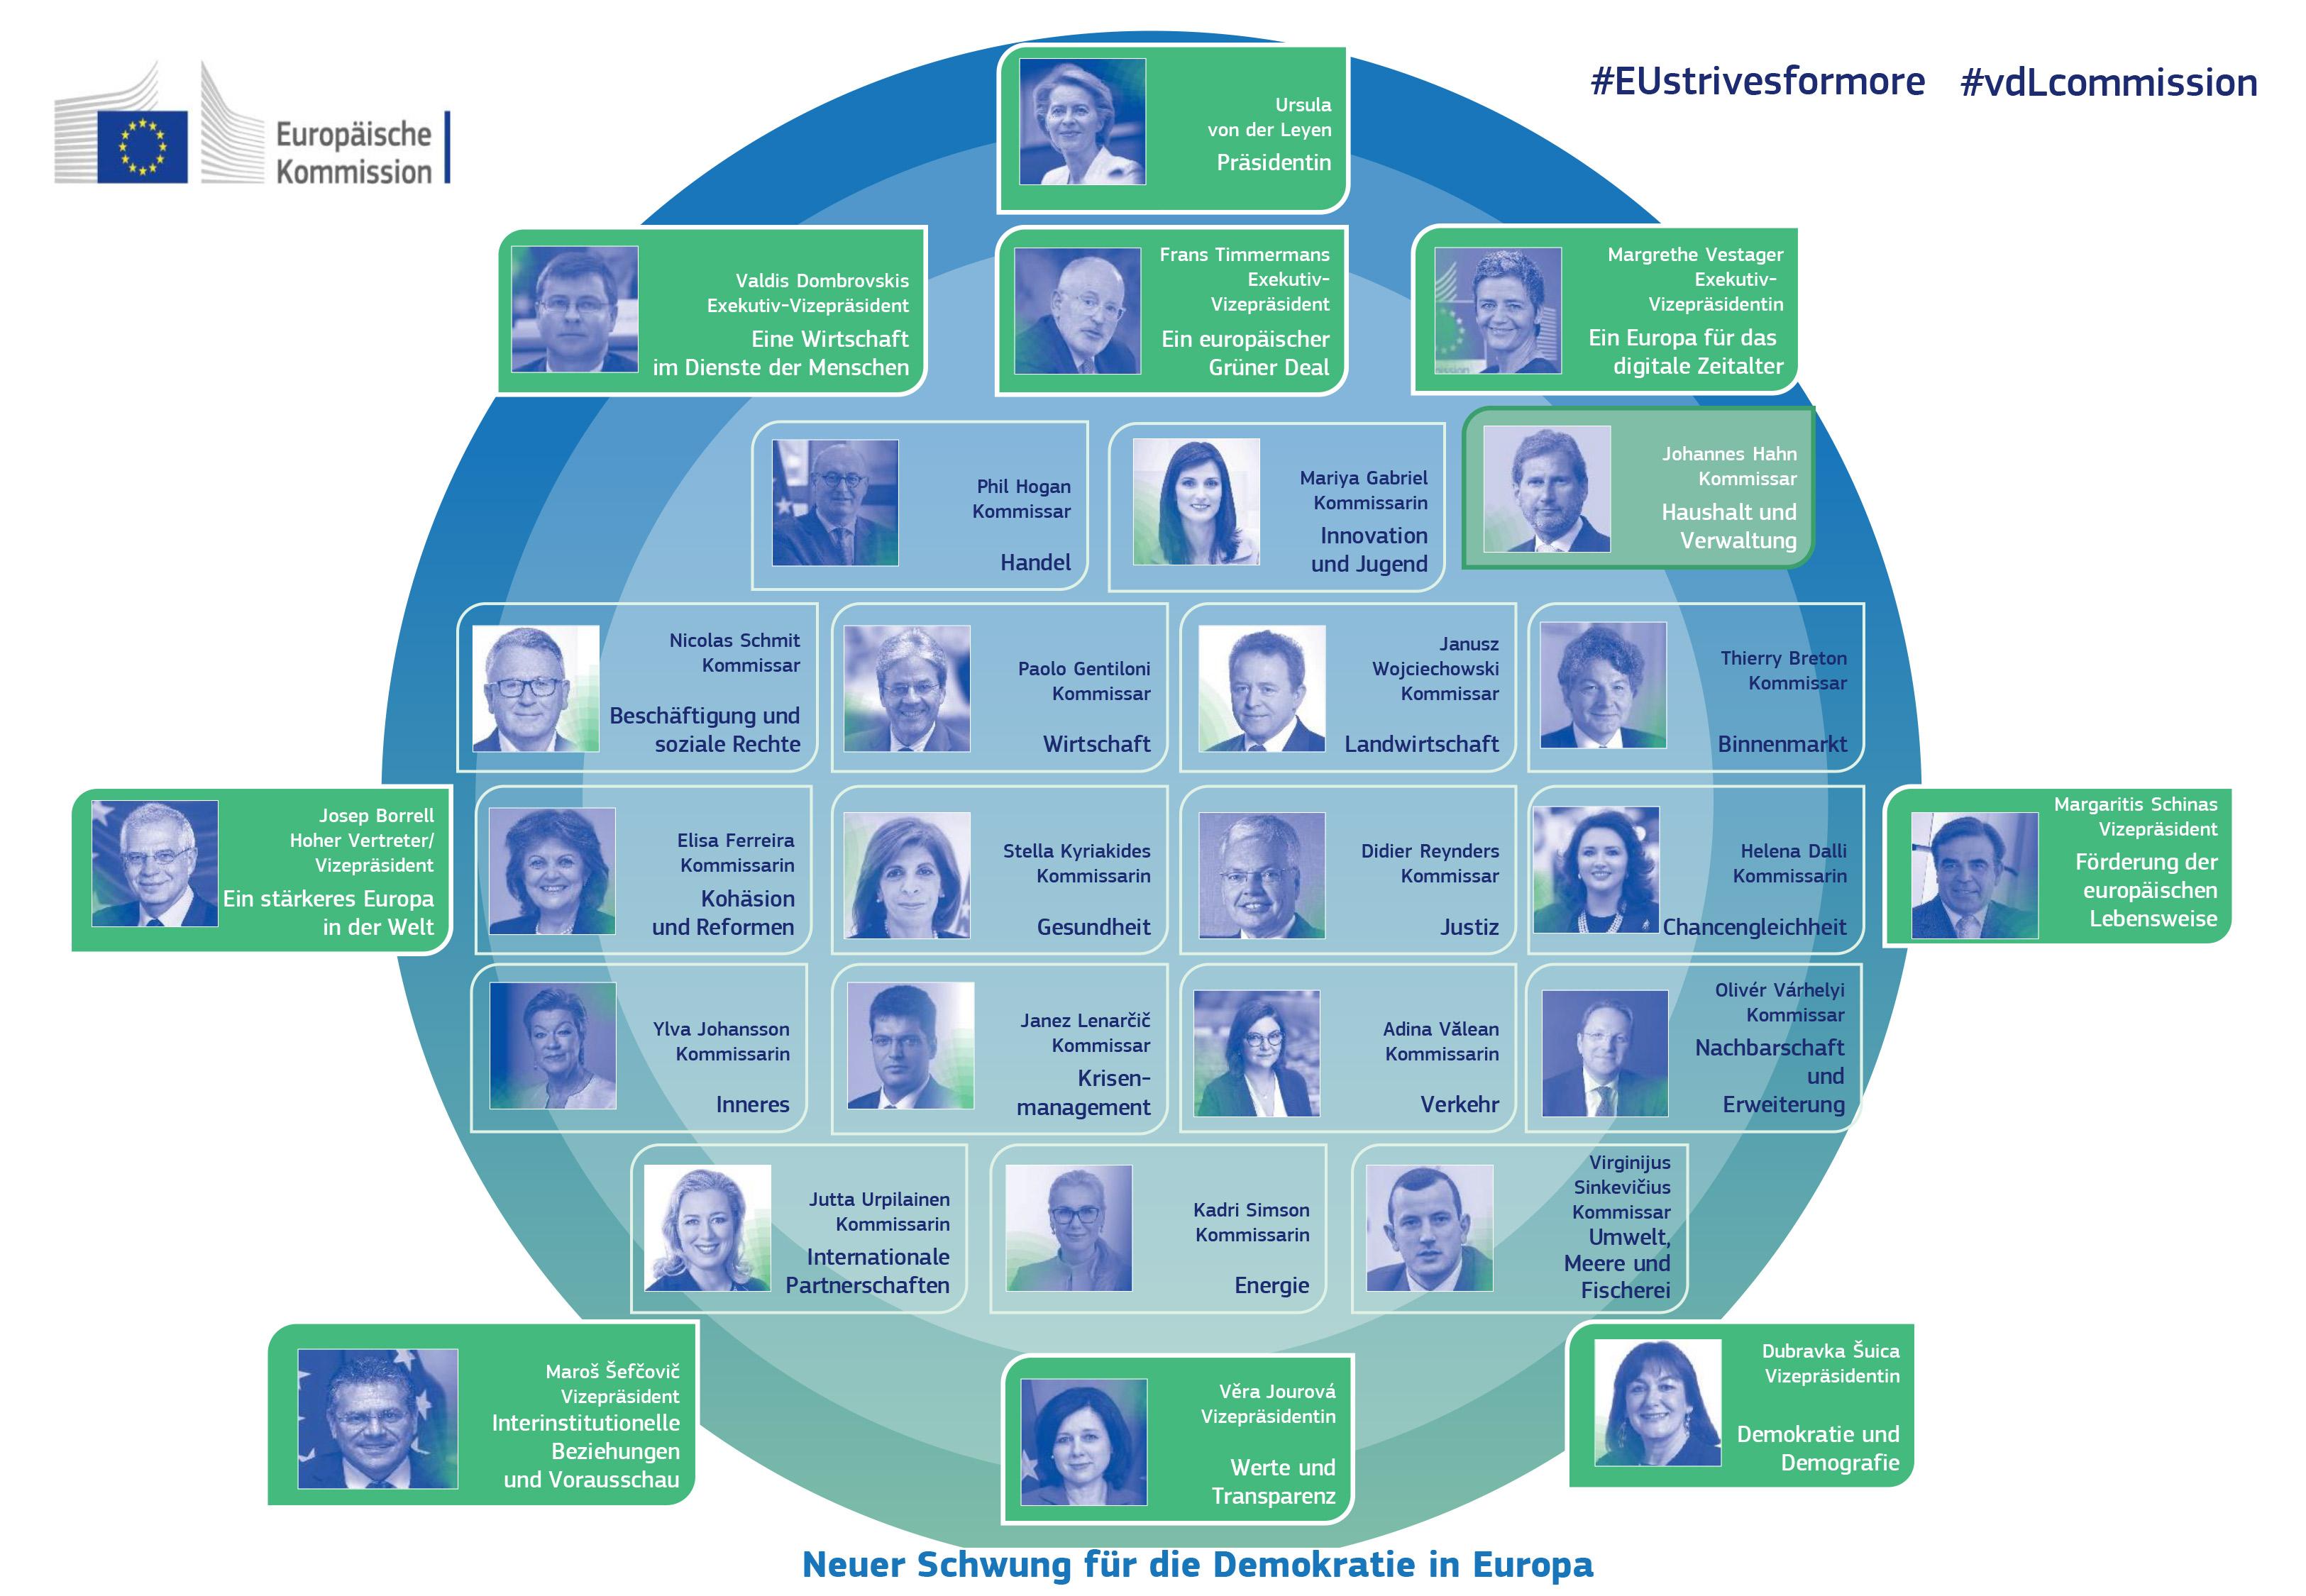 EU-Kommission 2014 - 2019 Fotos